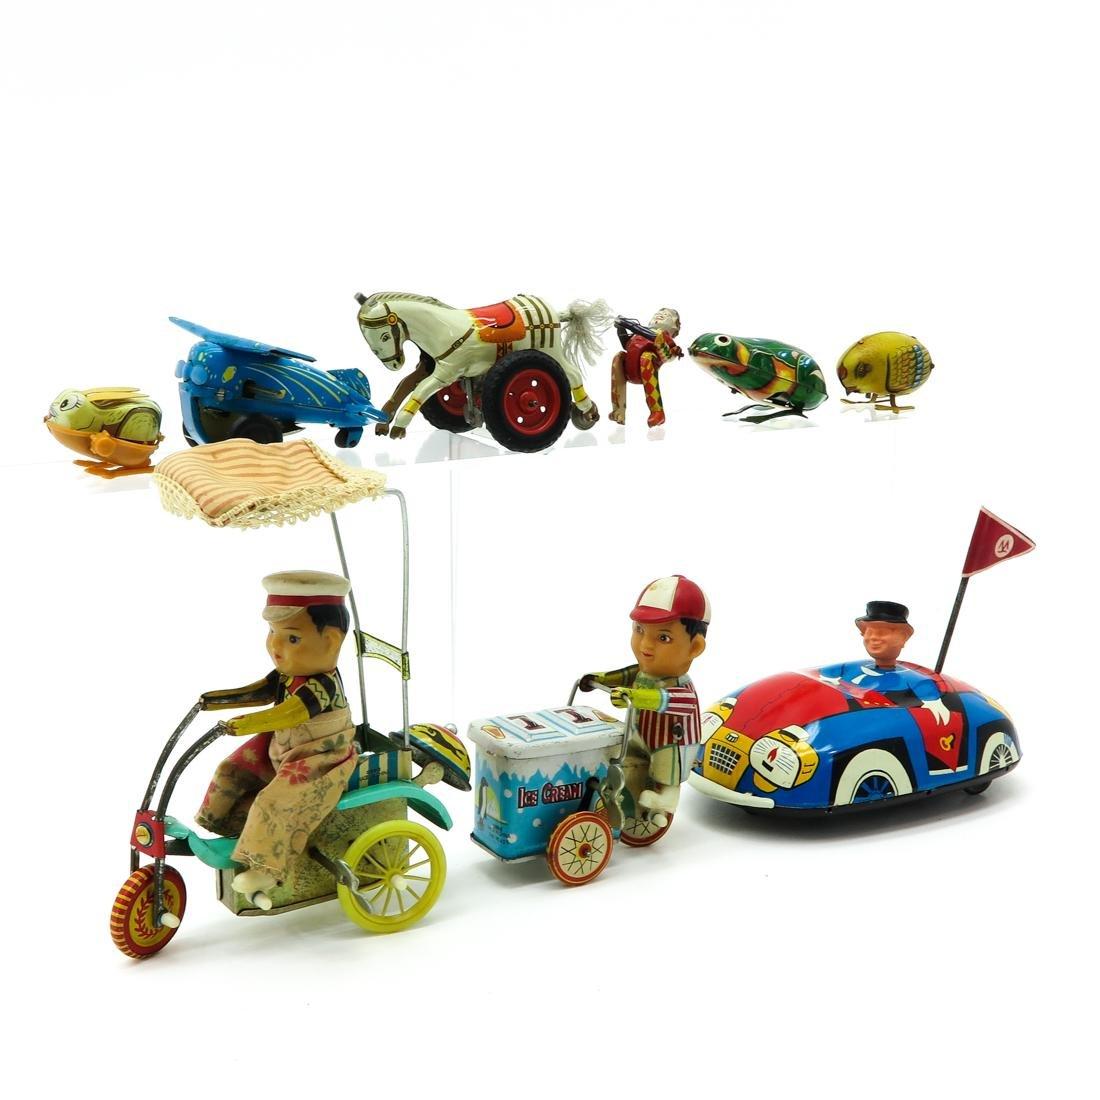 Diverse Lot of 8 Vintage Toys - 2